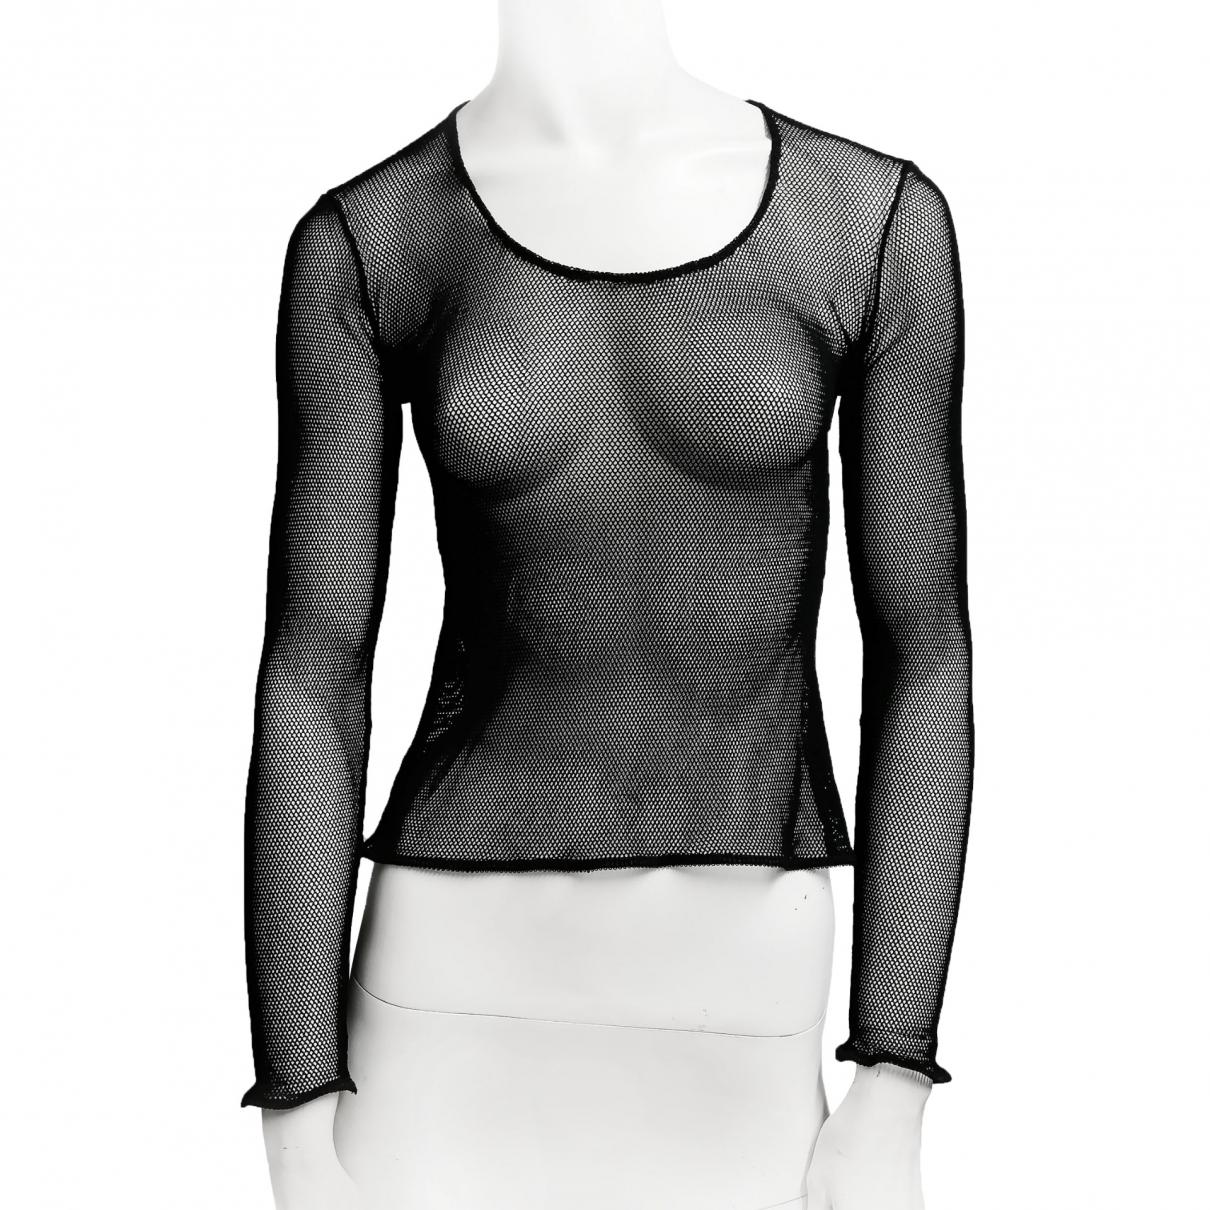 Dolce & Gabbana \N Black  top for Women S International